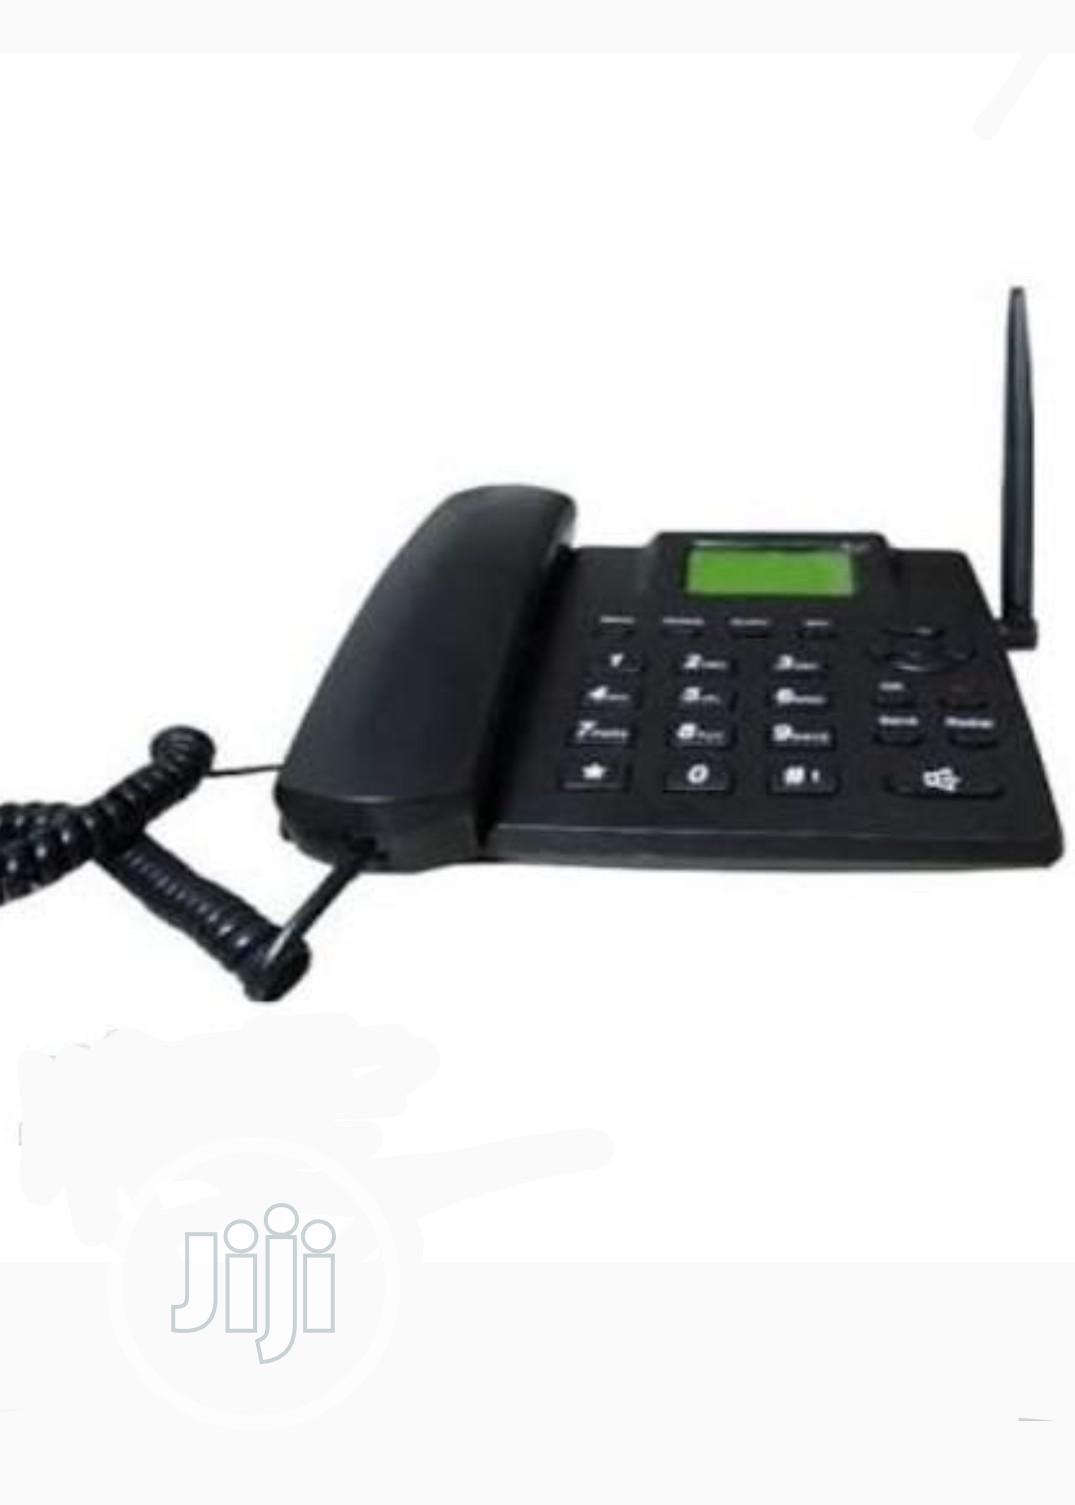 Ddk GSM Landphone And Call Transfer Features DDK - 2 Sim Cards